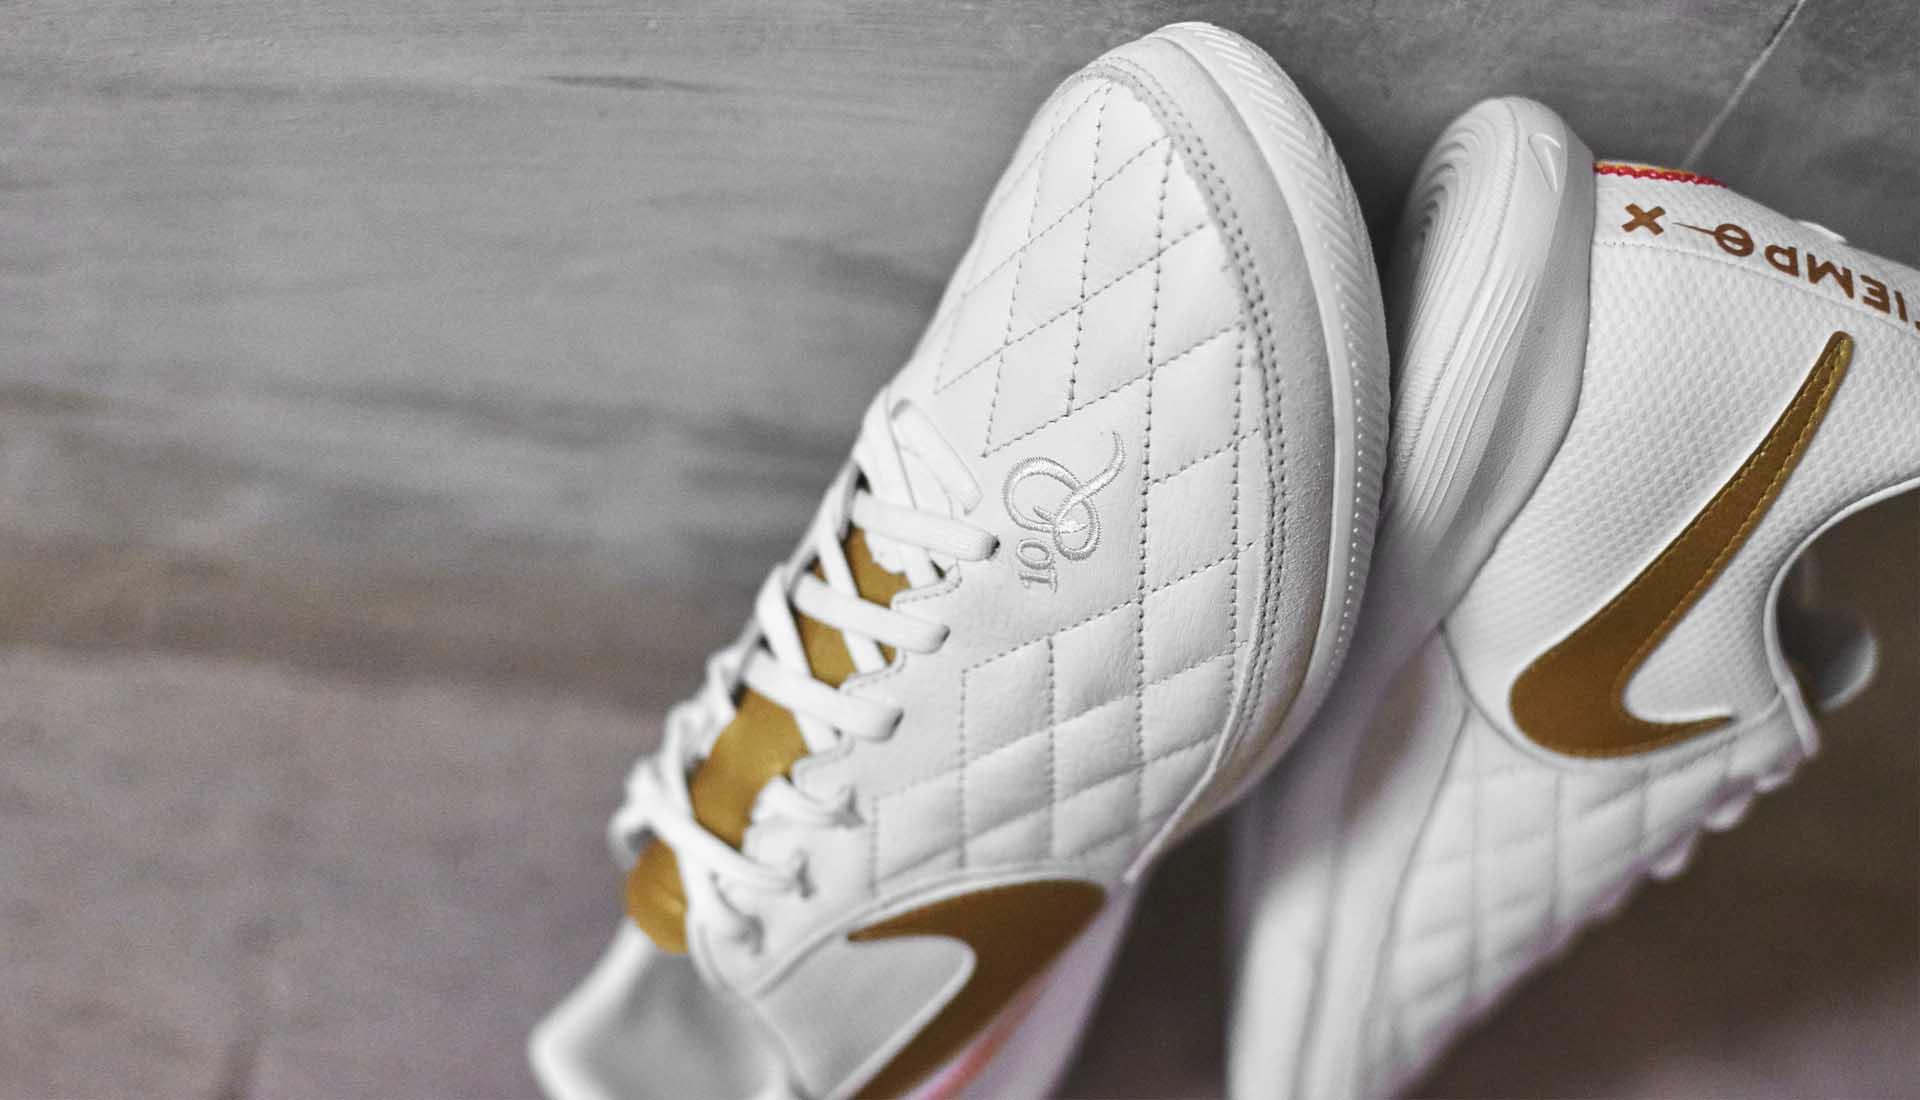 chaussures-football-Nike-Tiempo-X-10R-Barcelone-img2